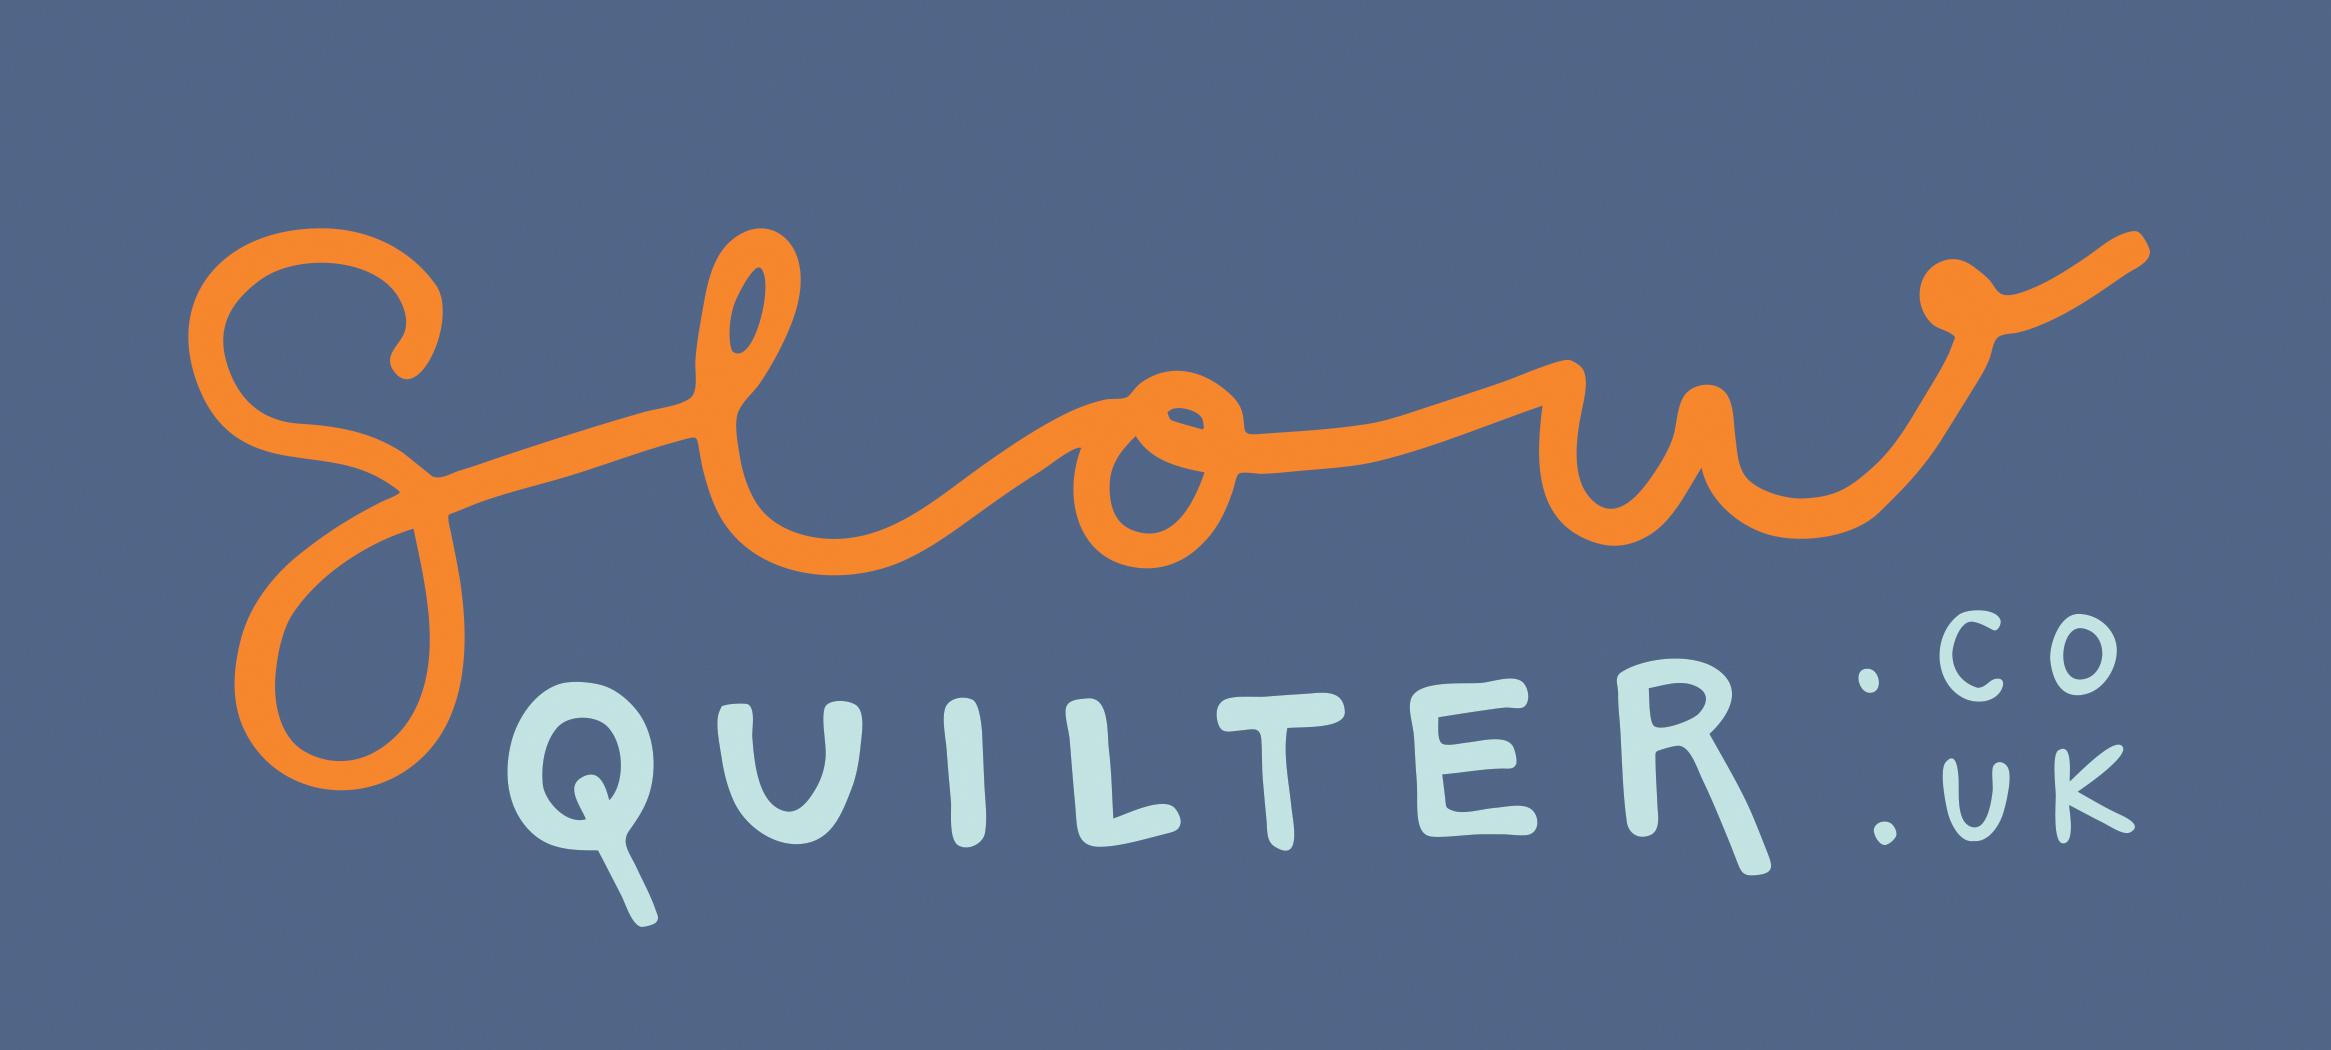 slow quilter logo.jpg